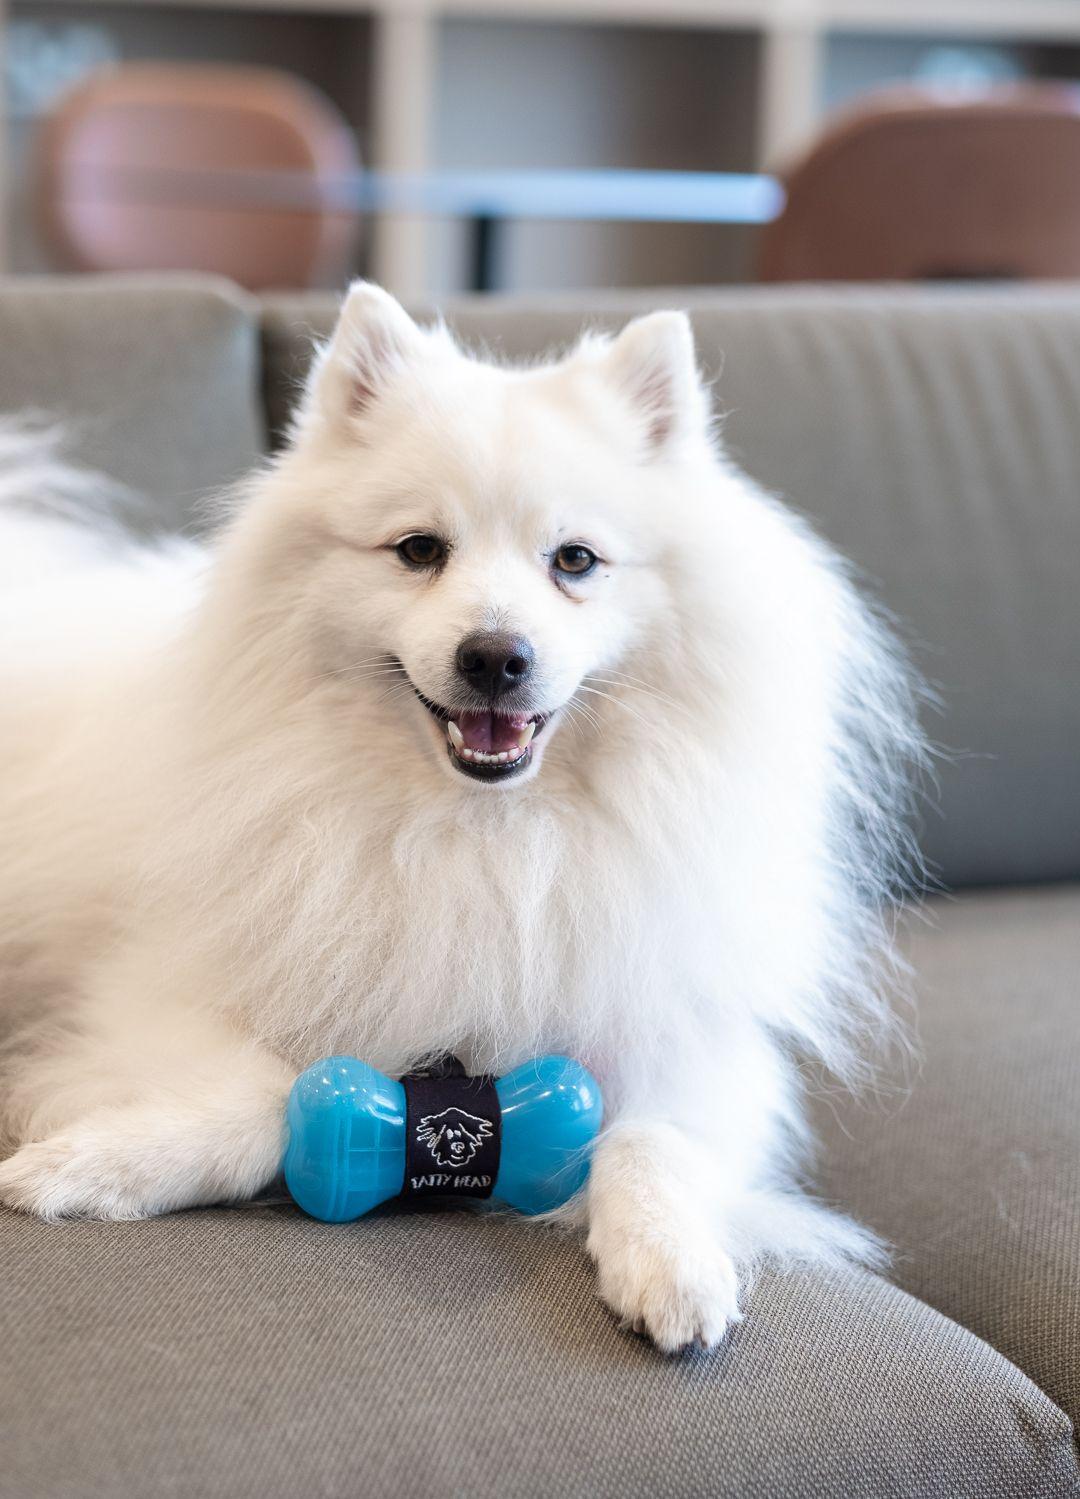 Koda loves his home-made treats in his Twist 'N' Treat